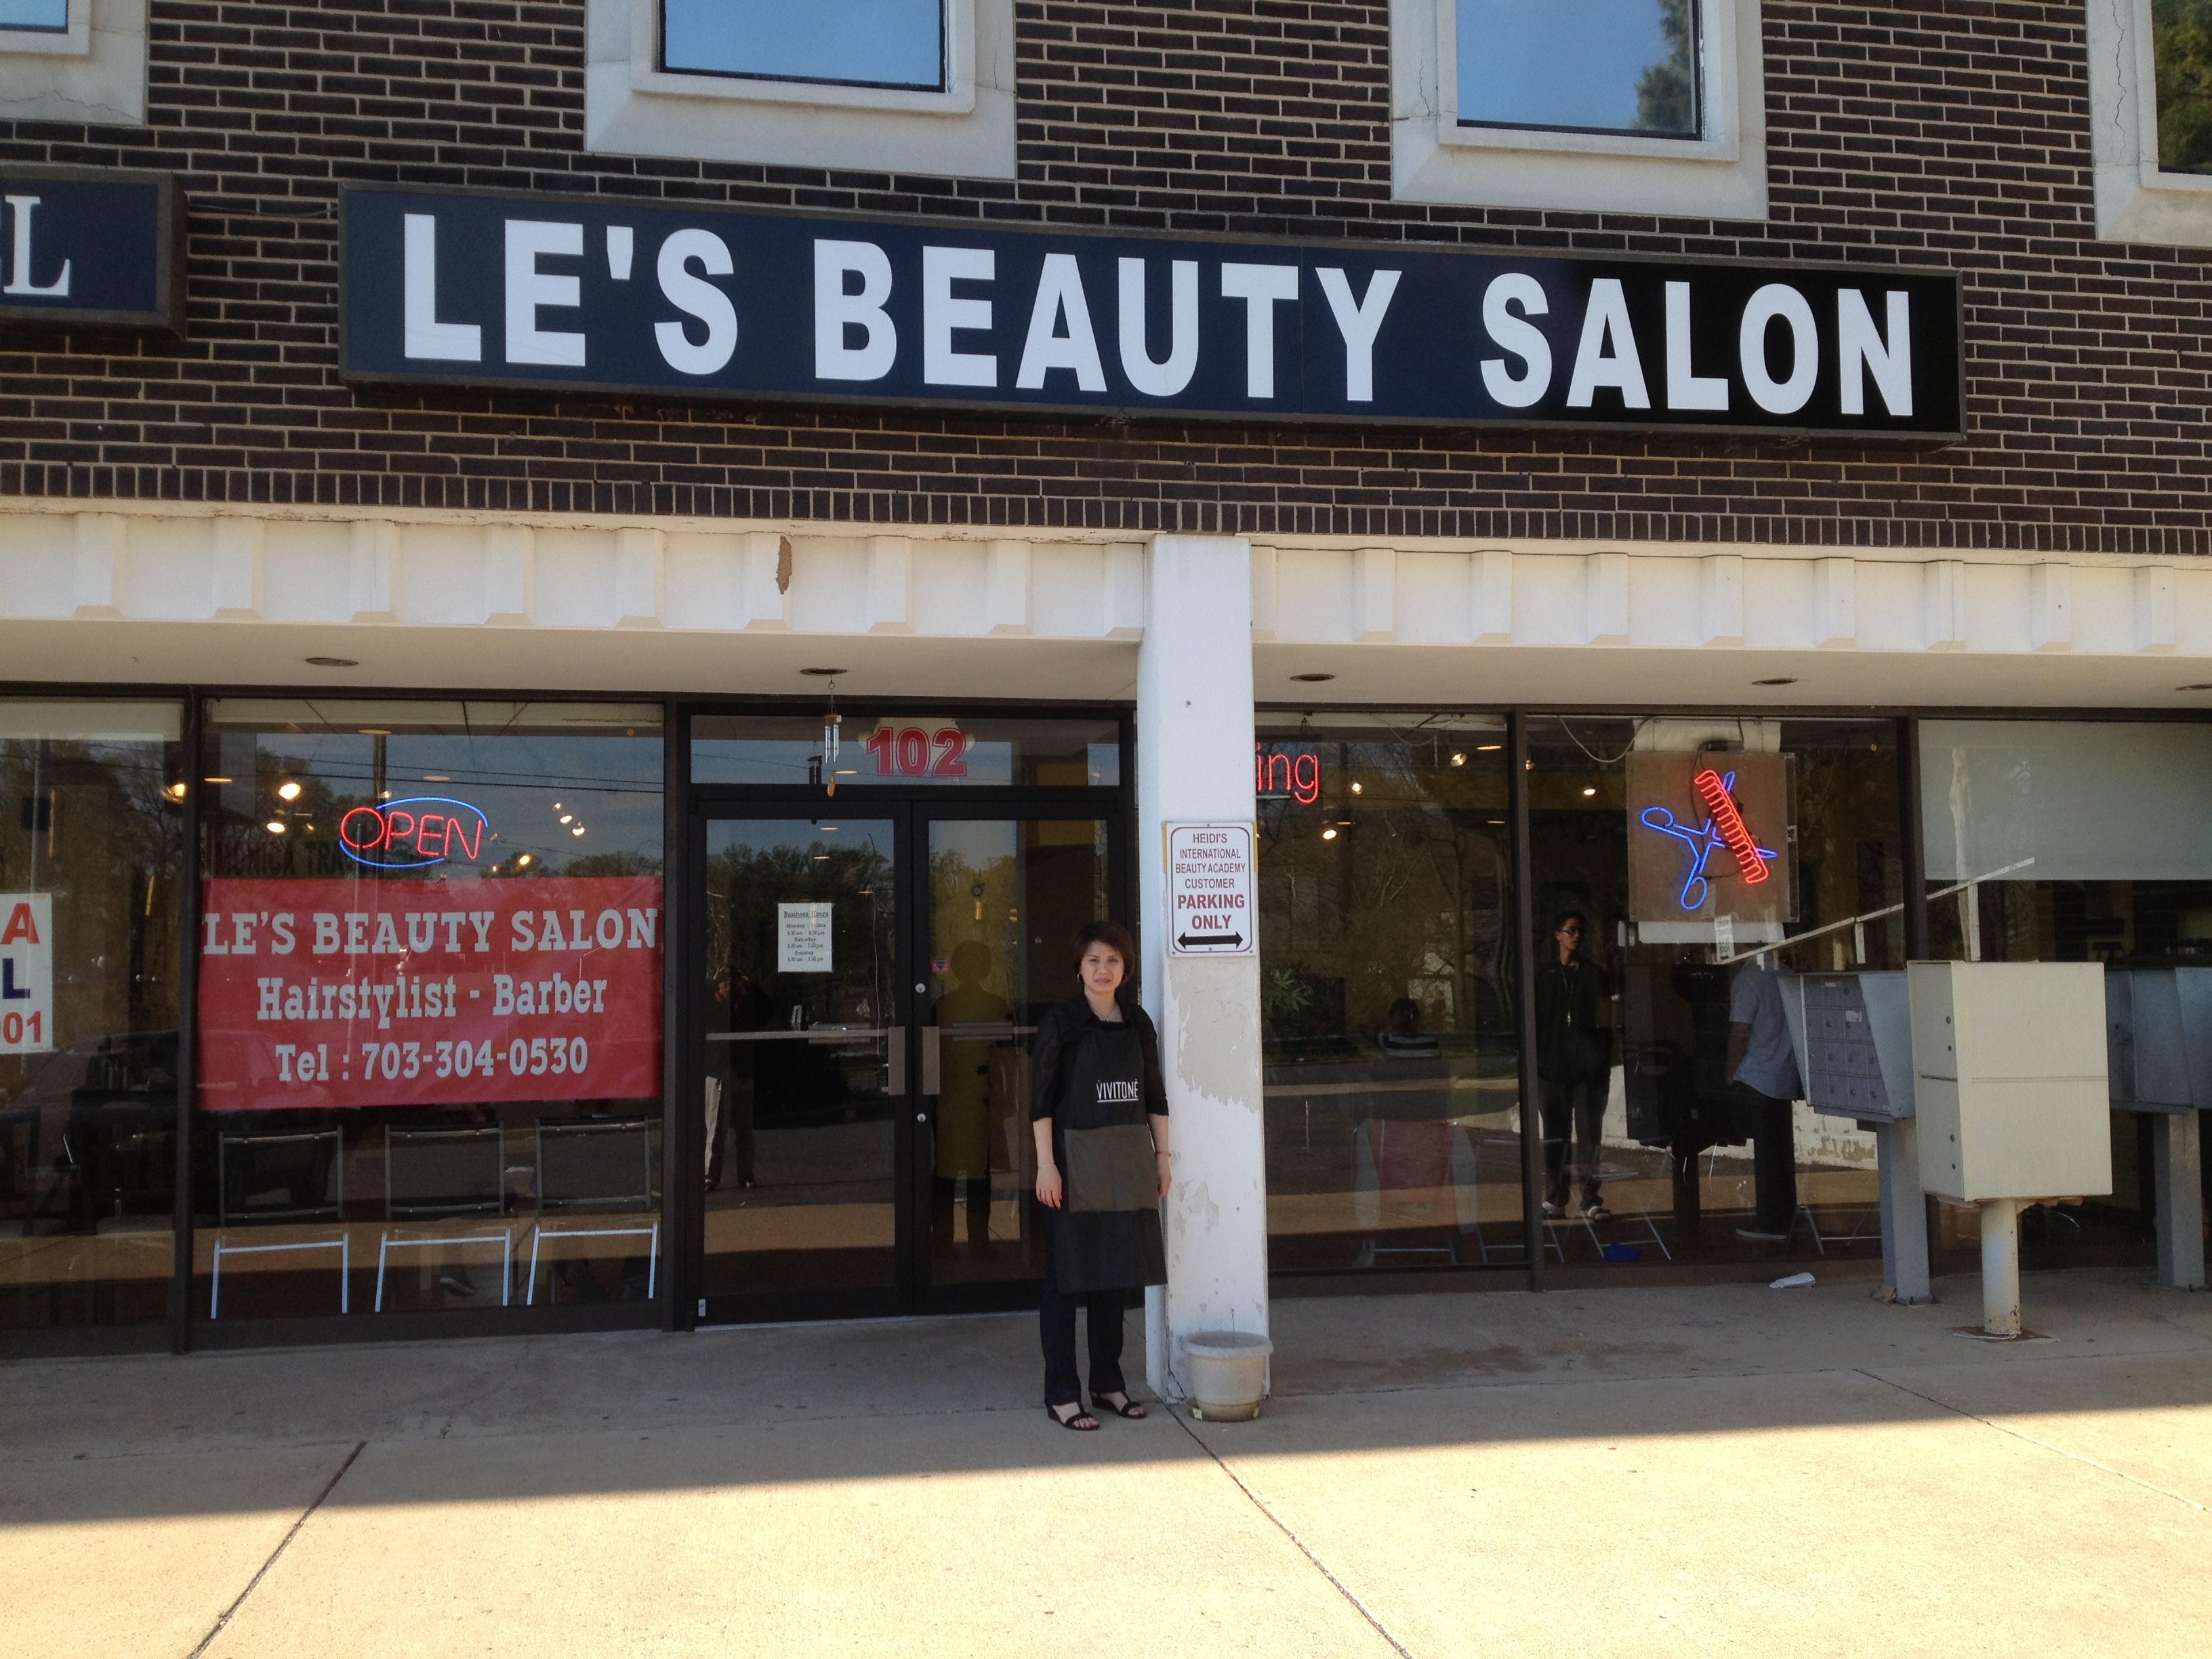 Le' Beauty Salon 32 Arlington Blvd Ste 32, Falls Church, VA ...